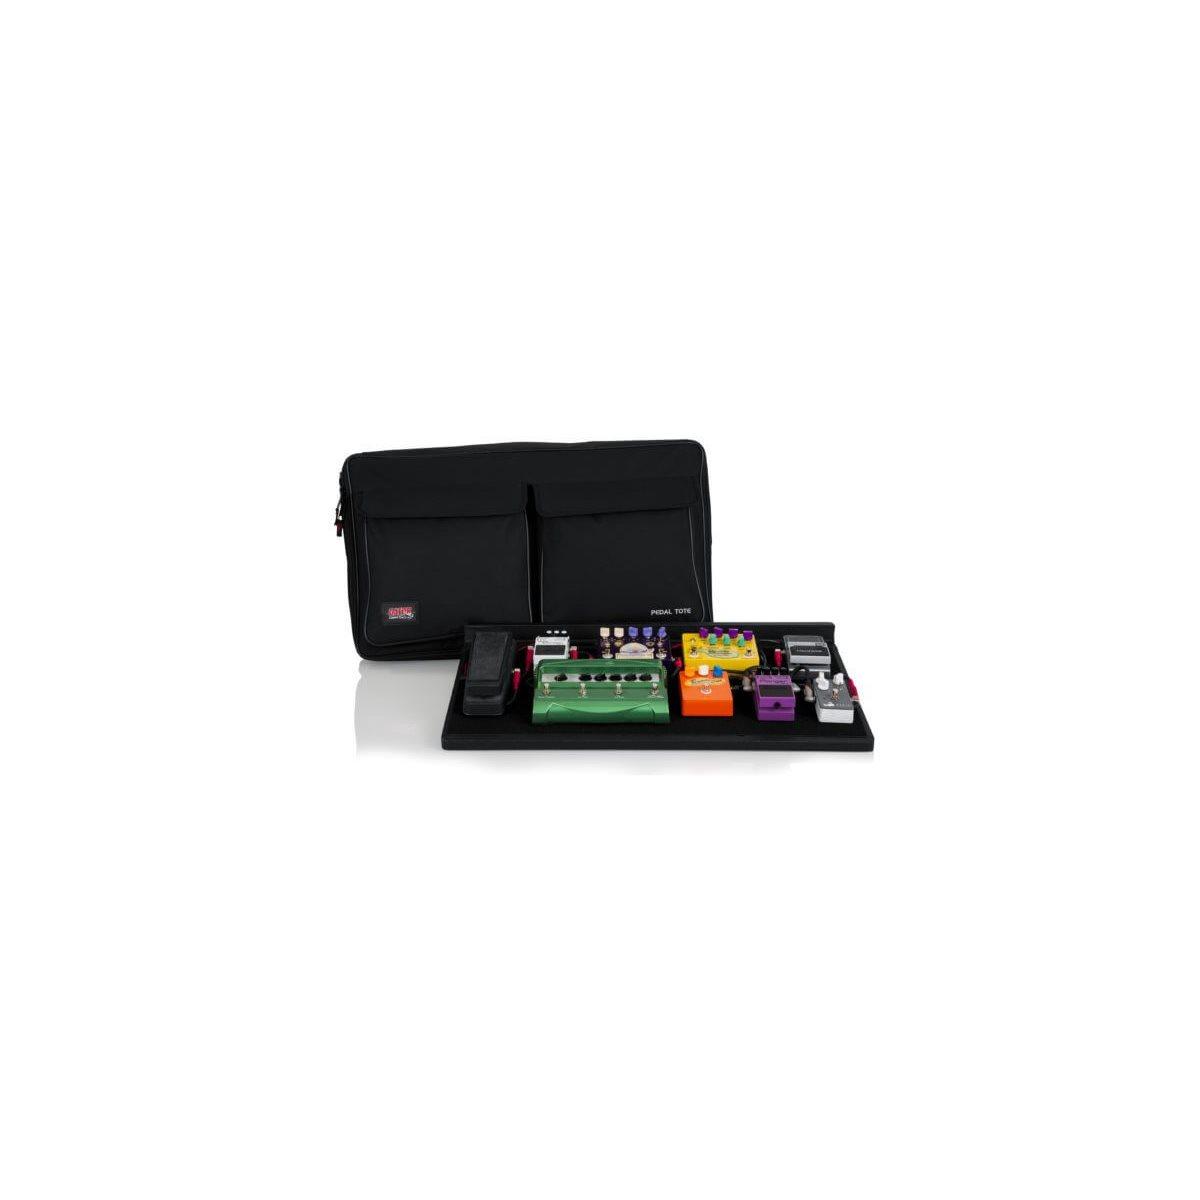 GATOR - GPTPRO-PWR - Pedal Board W / Carry Bag & Power Supply; Pro Size